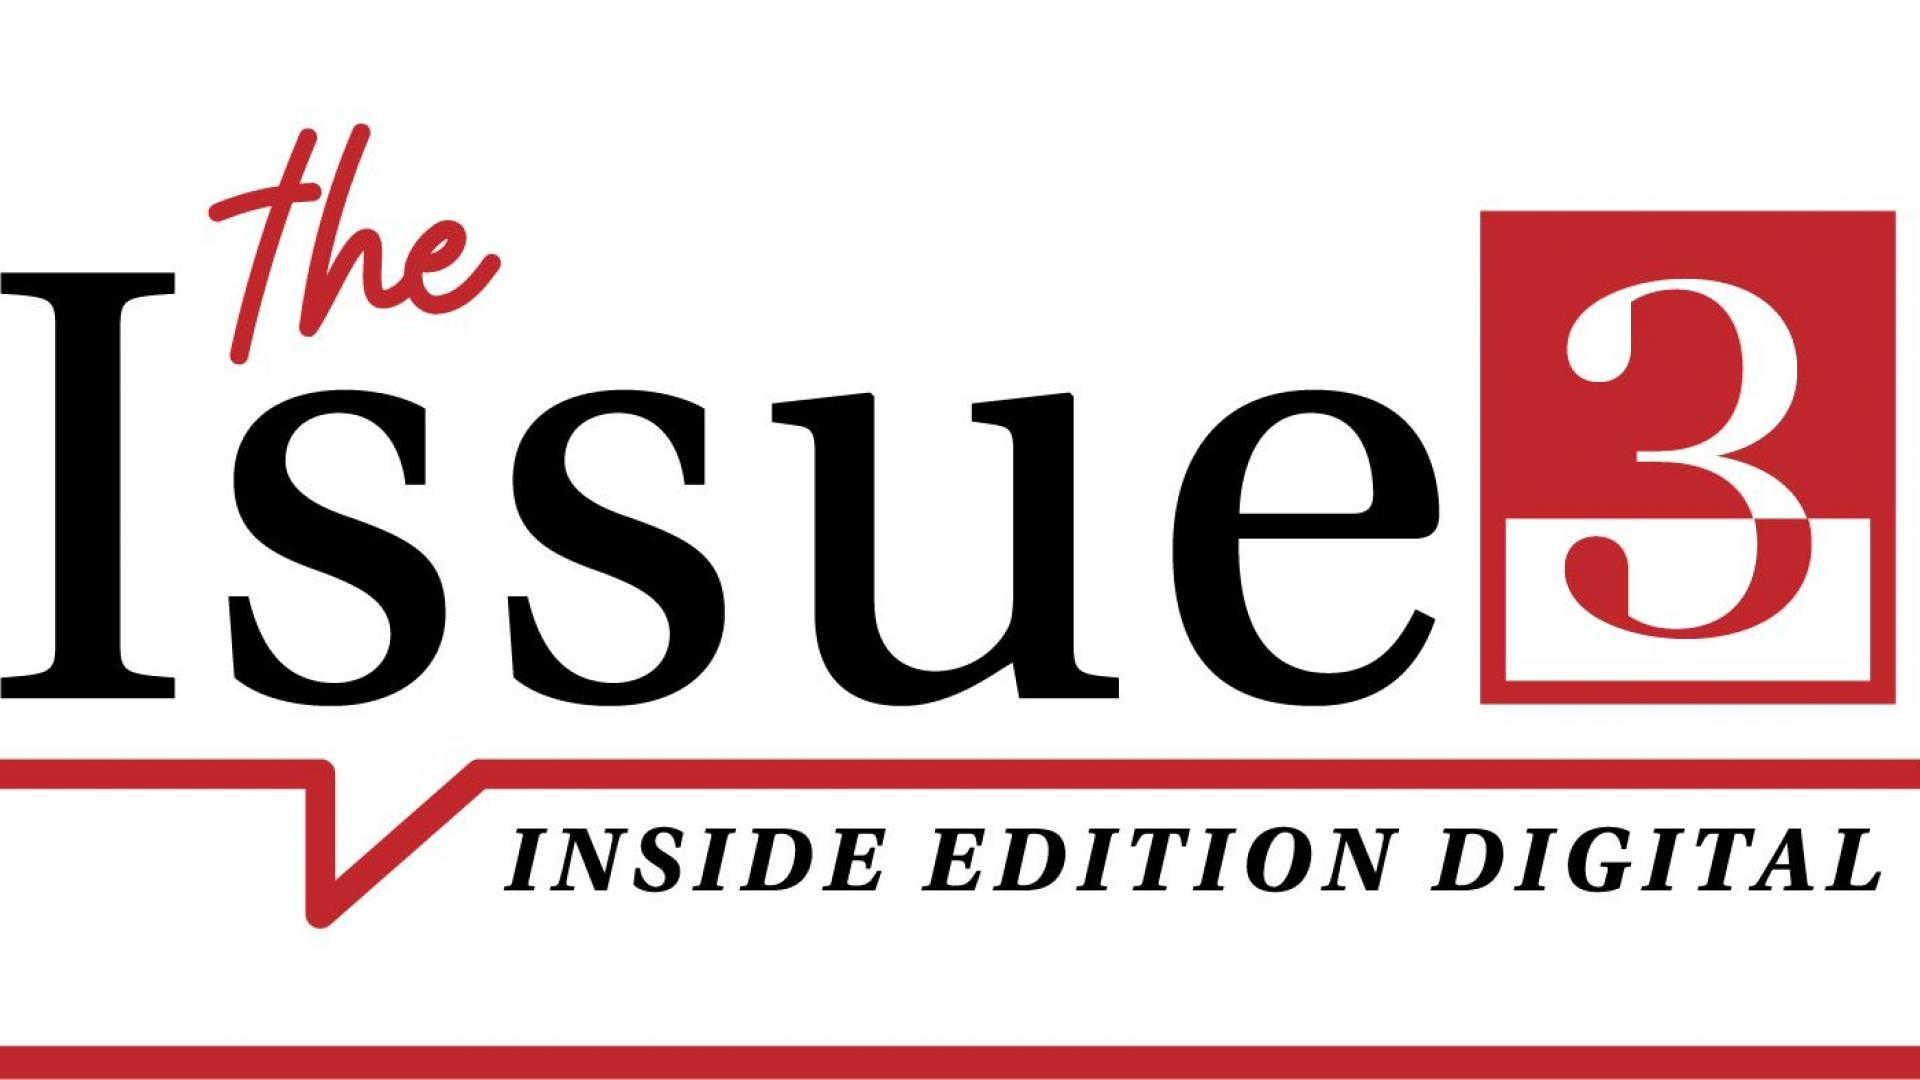 Issue 3 logo